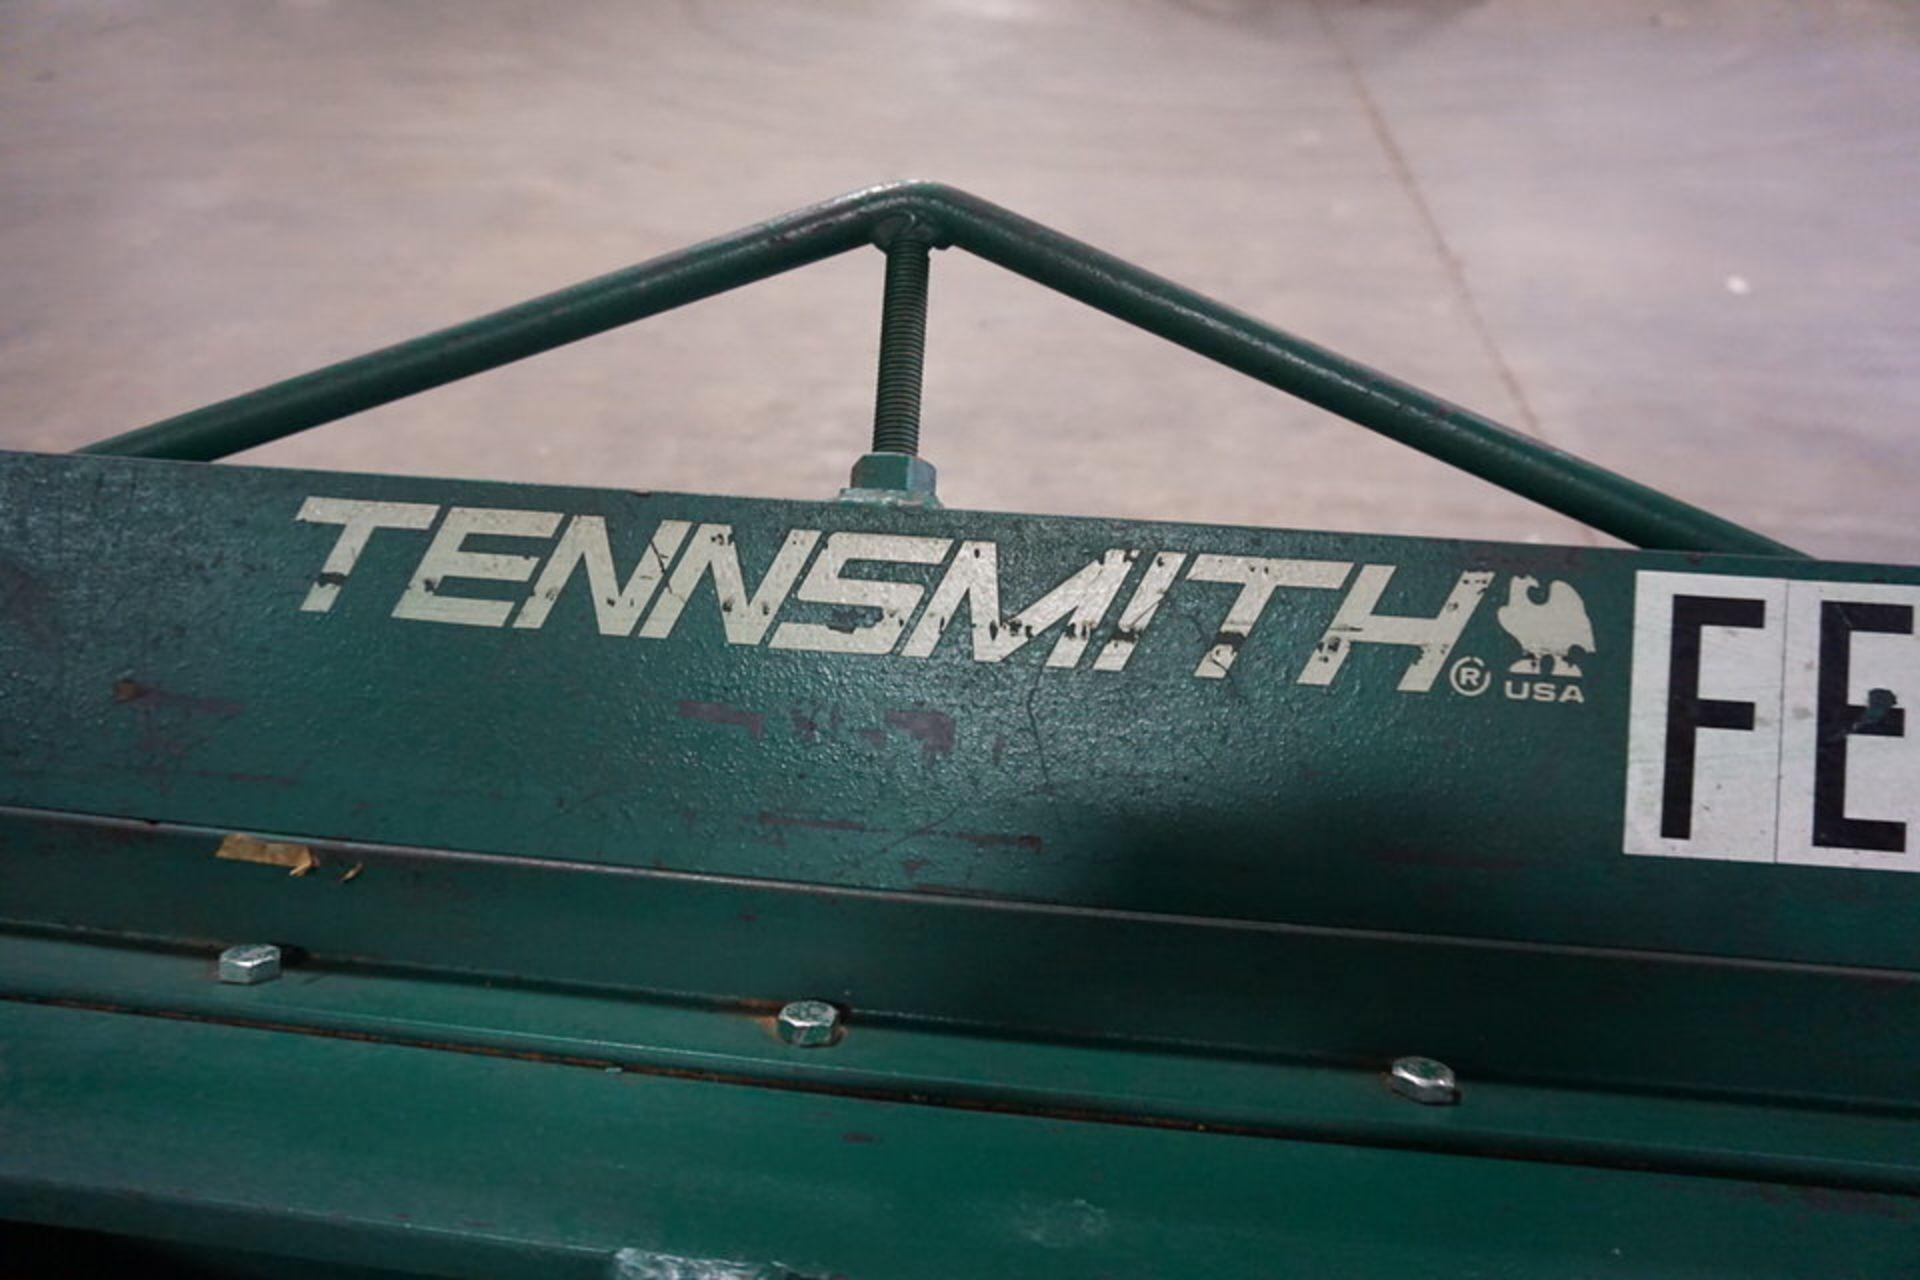 Lot 7 - TENNSMITH 4' SHEET METAL BLADE, MDL: HB54816, 16 GA CAP W/ STAND (Location: 903 Blue Starr,